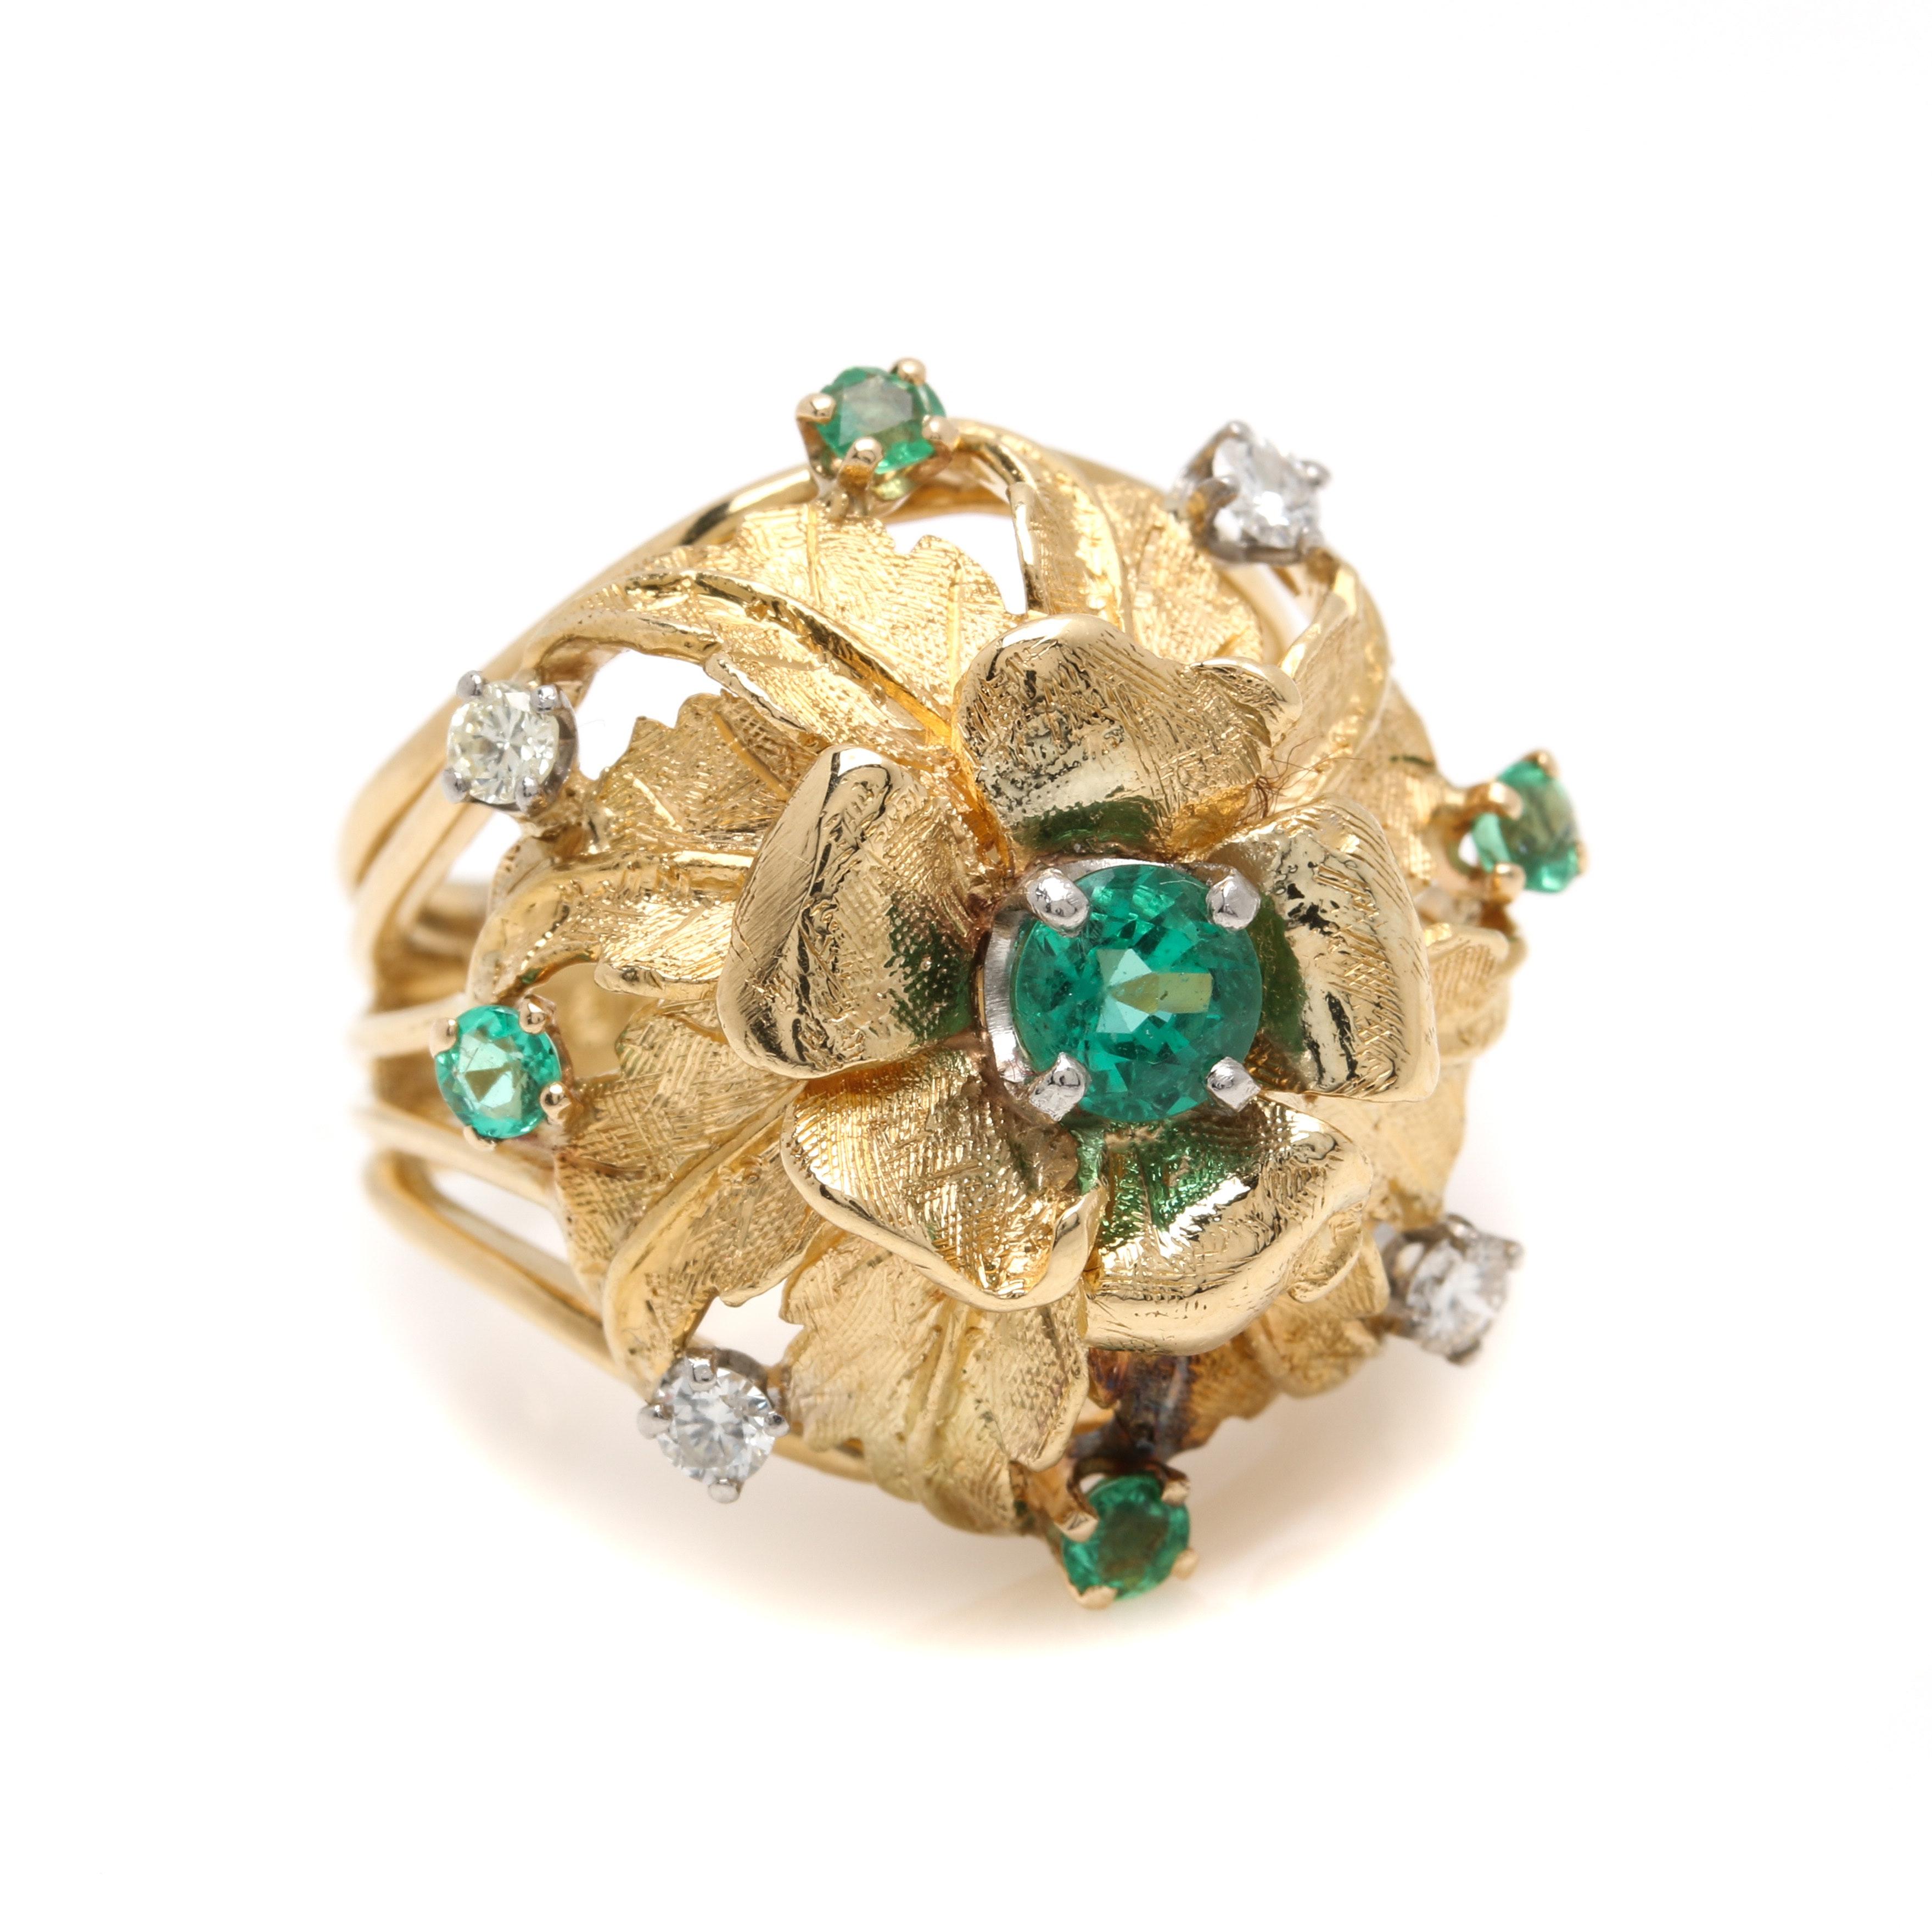 10K Yellow Gold Emerald and Diamond Flower Ring